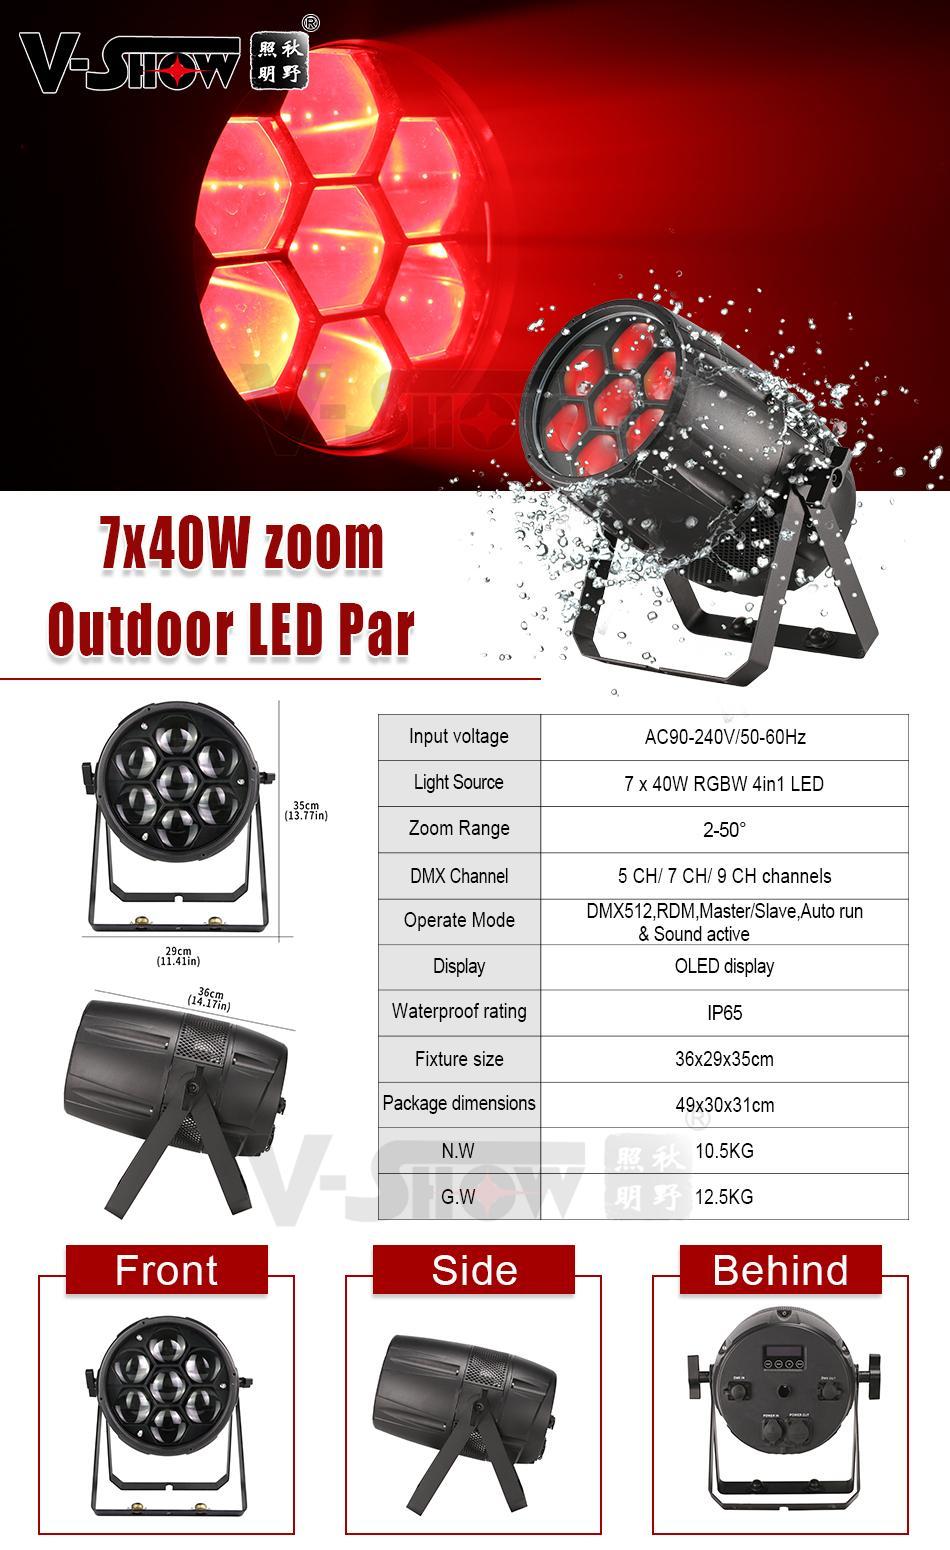 Outdoor Waterproof 7*40W Zoom LED Par Light RGBW 4in1 DMX RDM Par Light for DJ D 2